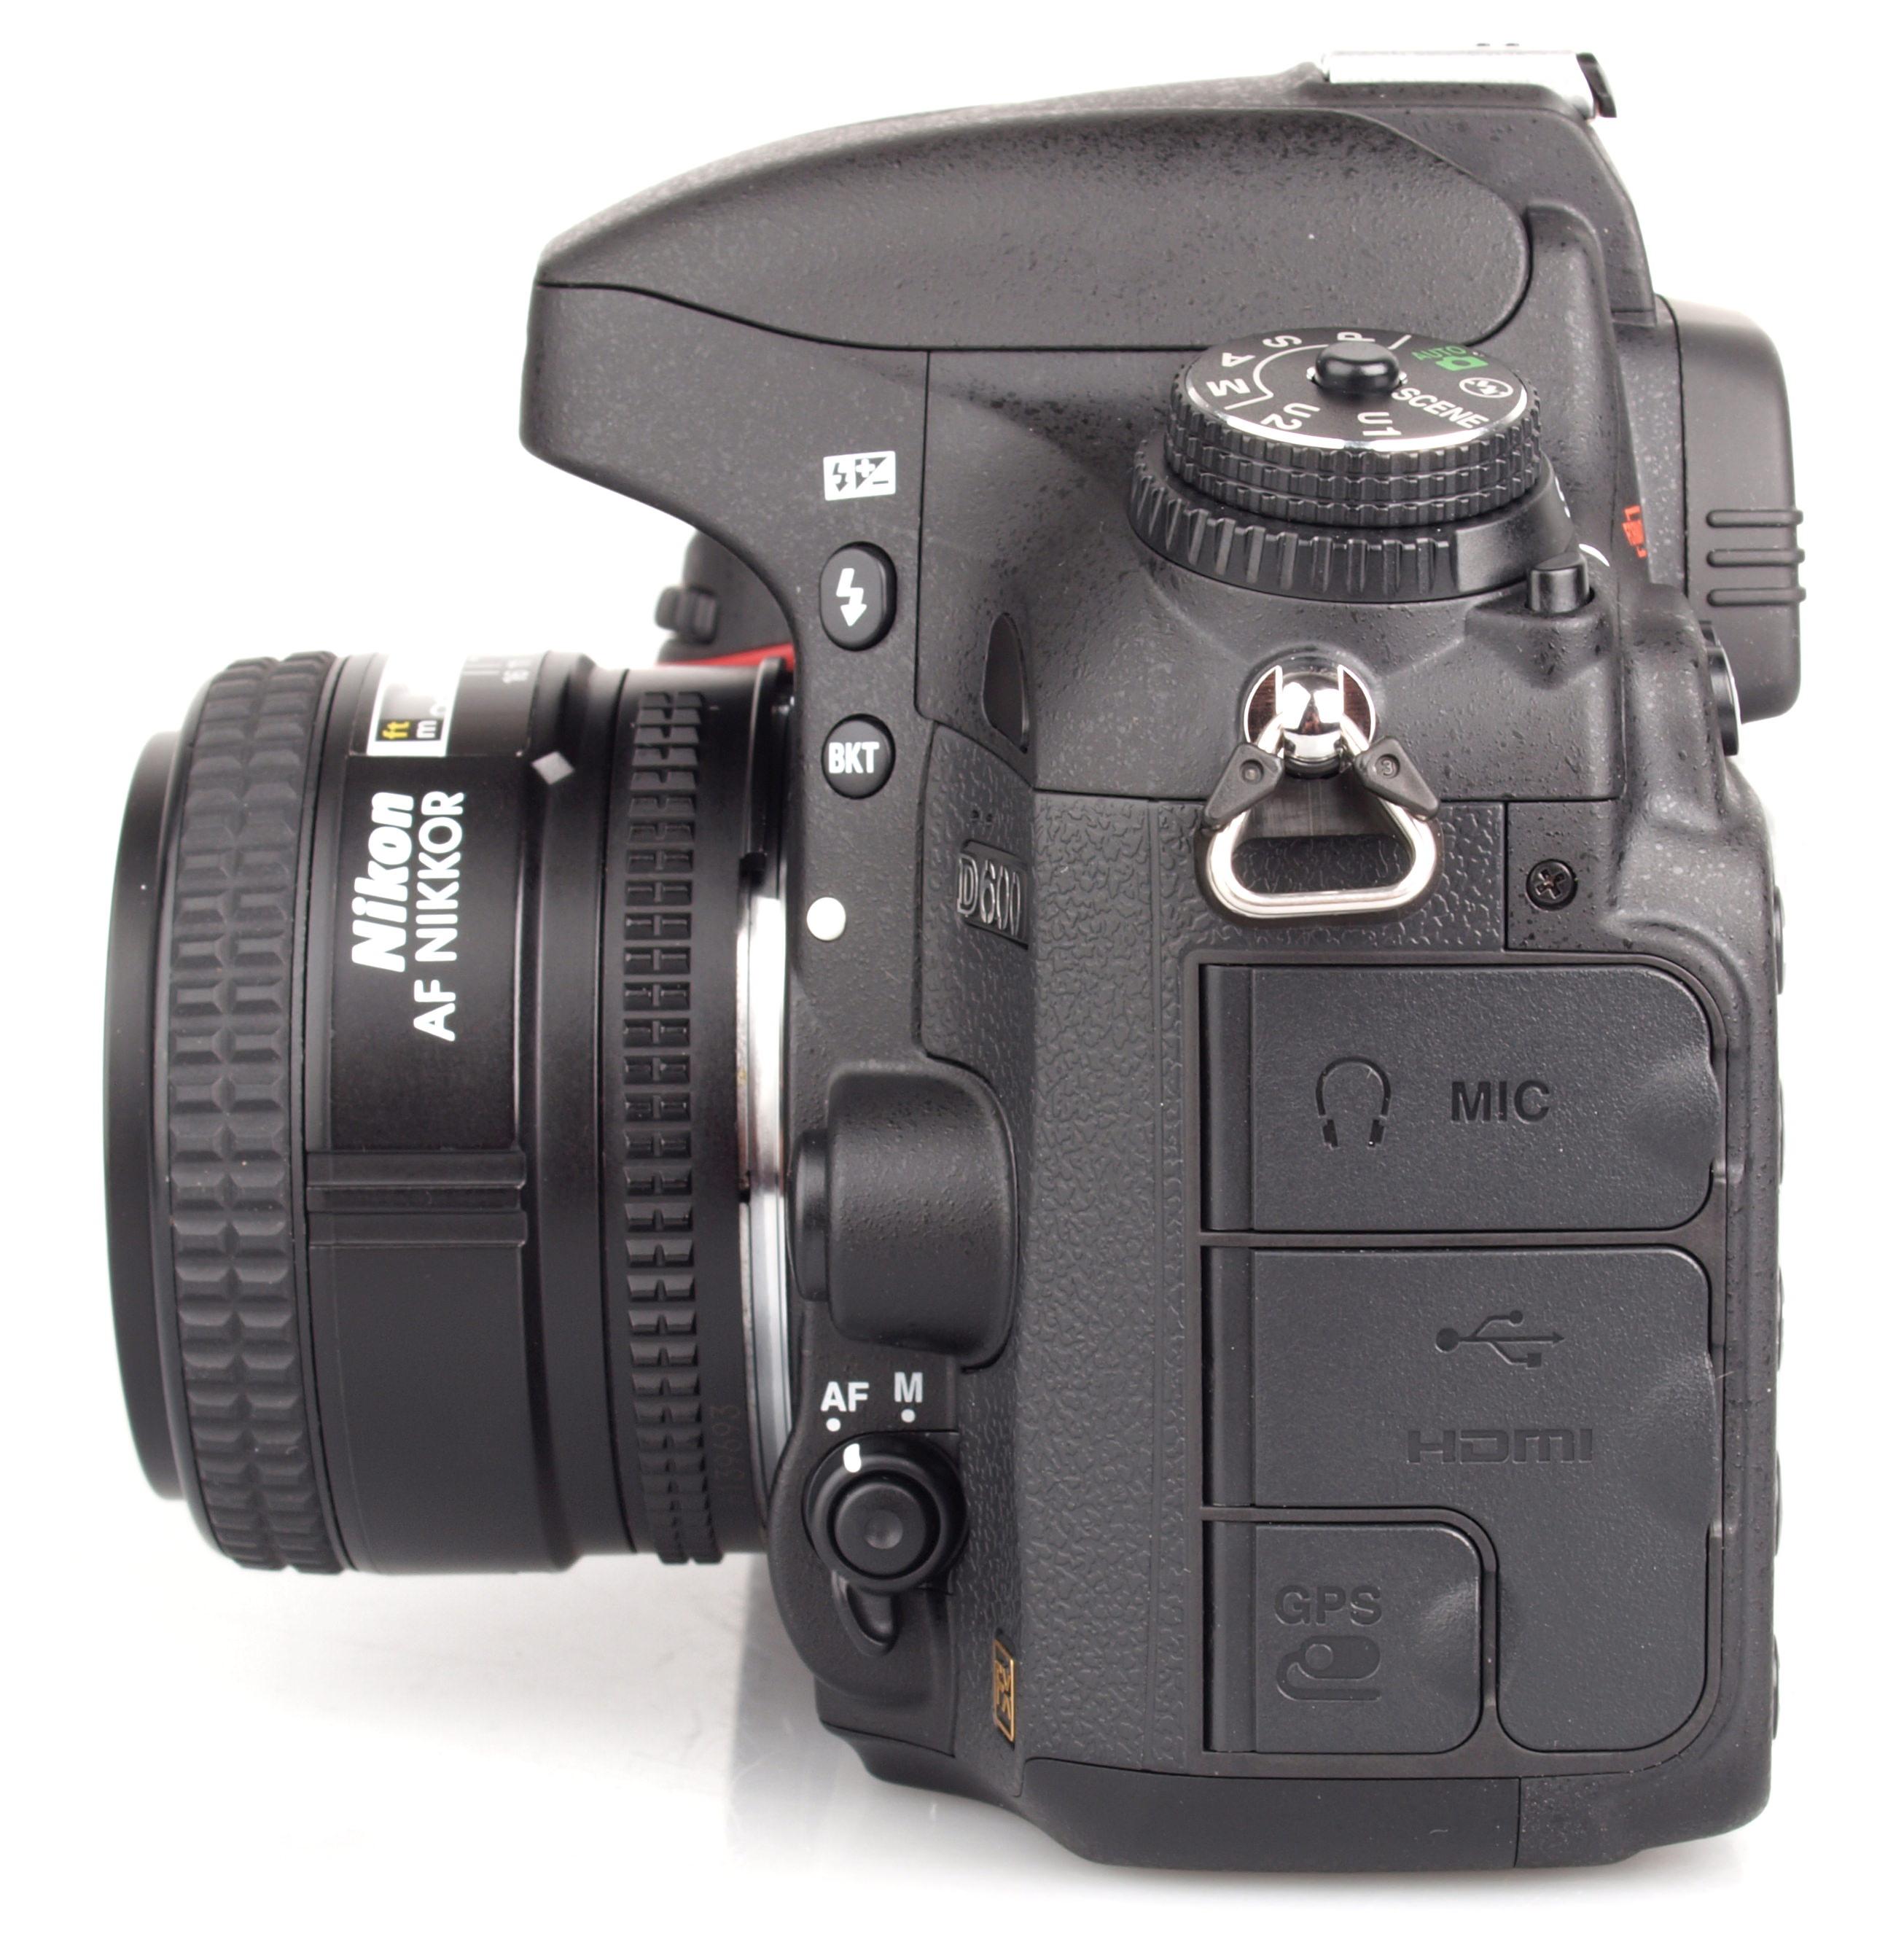 Nikon D600 Digital SLR Review | ePHOTOzine